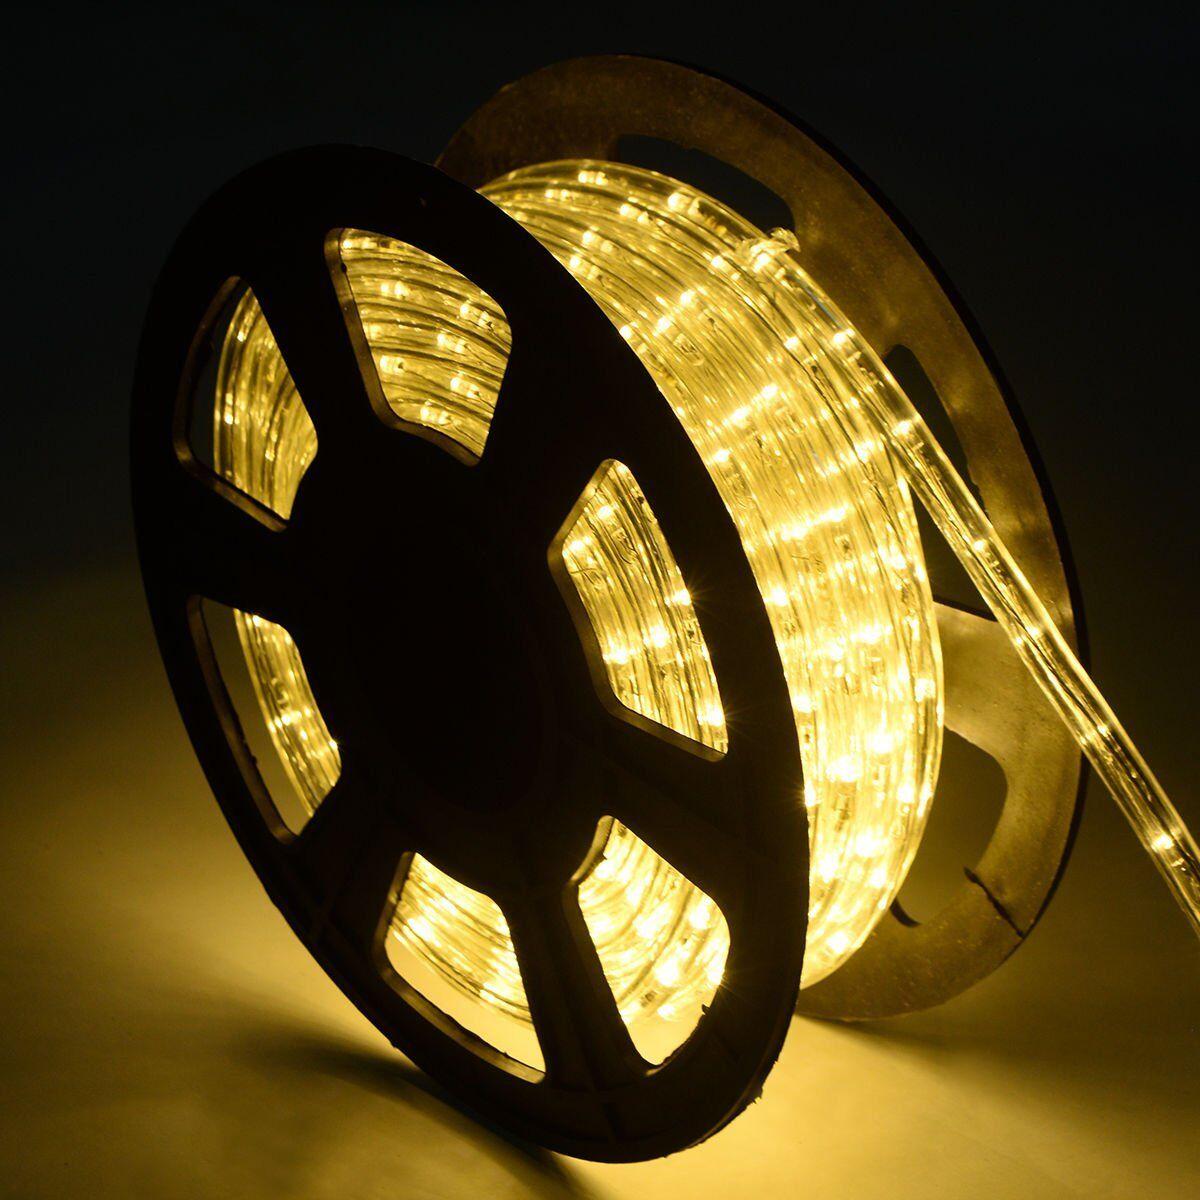 10M--50M SMD 5050 Lichtschlauch LED Schlauch Lichterkette Lichterkette Lichterkette Lichterketter Außen In | Flagship-Store  e78dfa